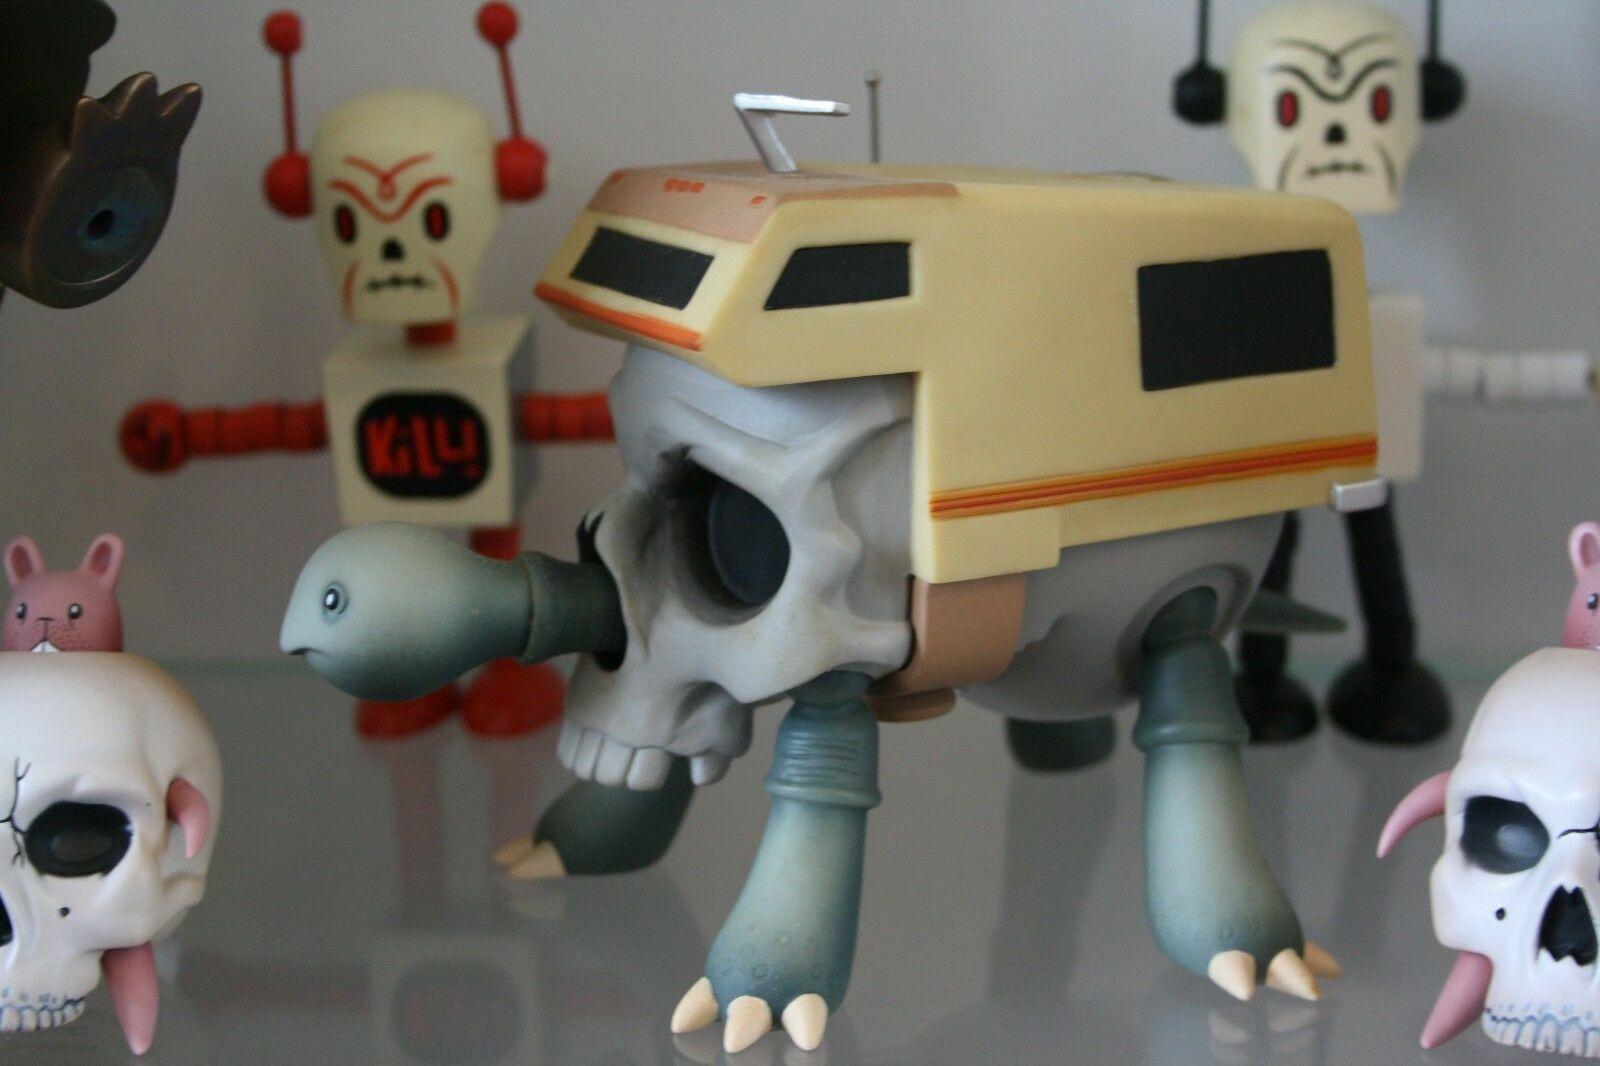 JEREMY FISH SKULL BUNNY 3  designer toy Ningyoushi Getsmall Getsmall Getsmall SF 2006 3ec31e